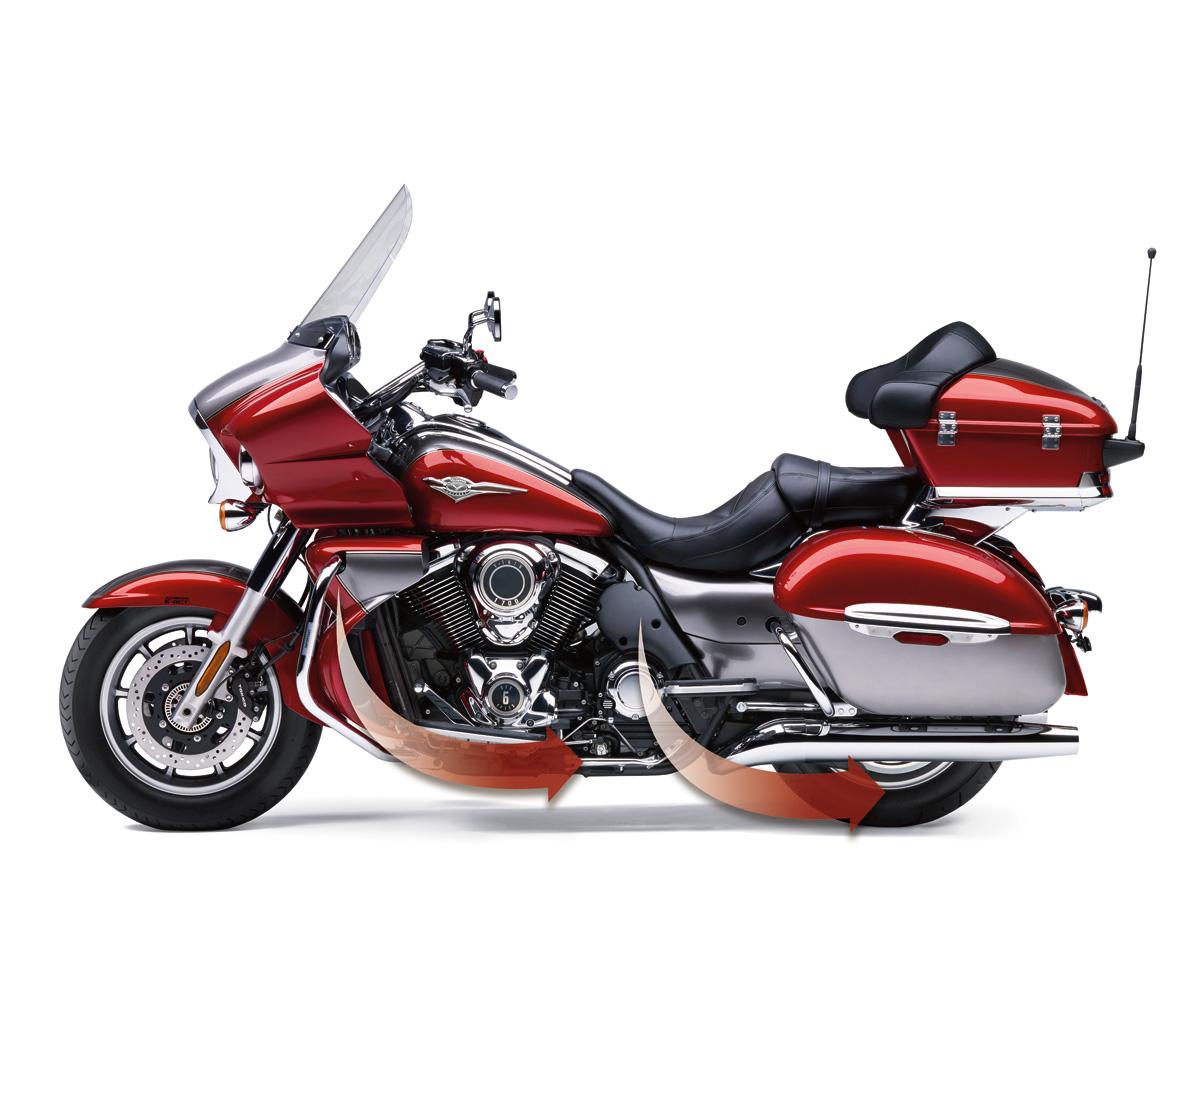 Combating Heat Vn1700 - Vulcan Motorcycle Journal